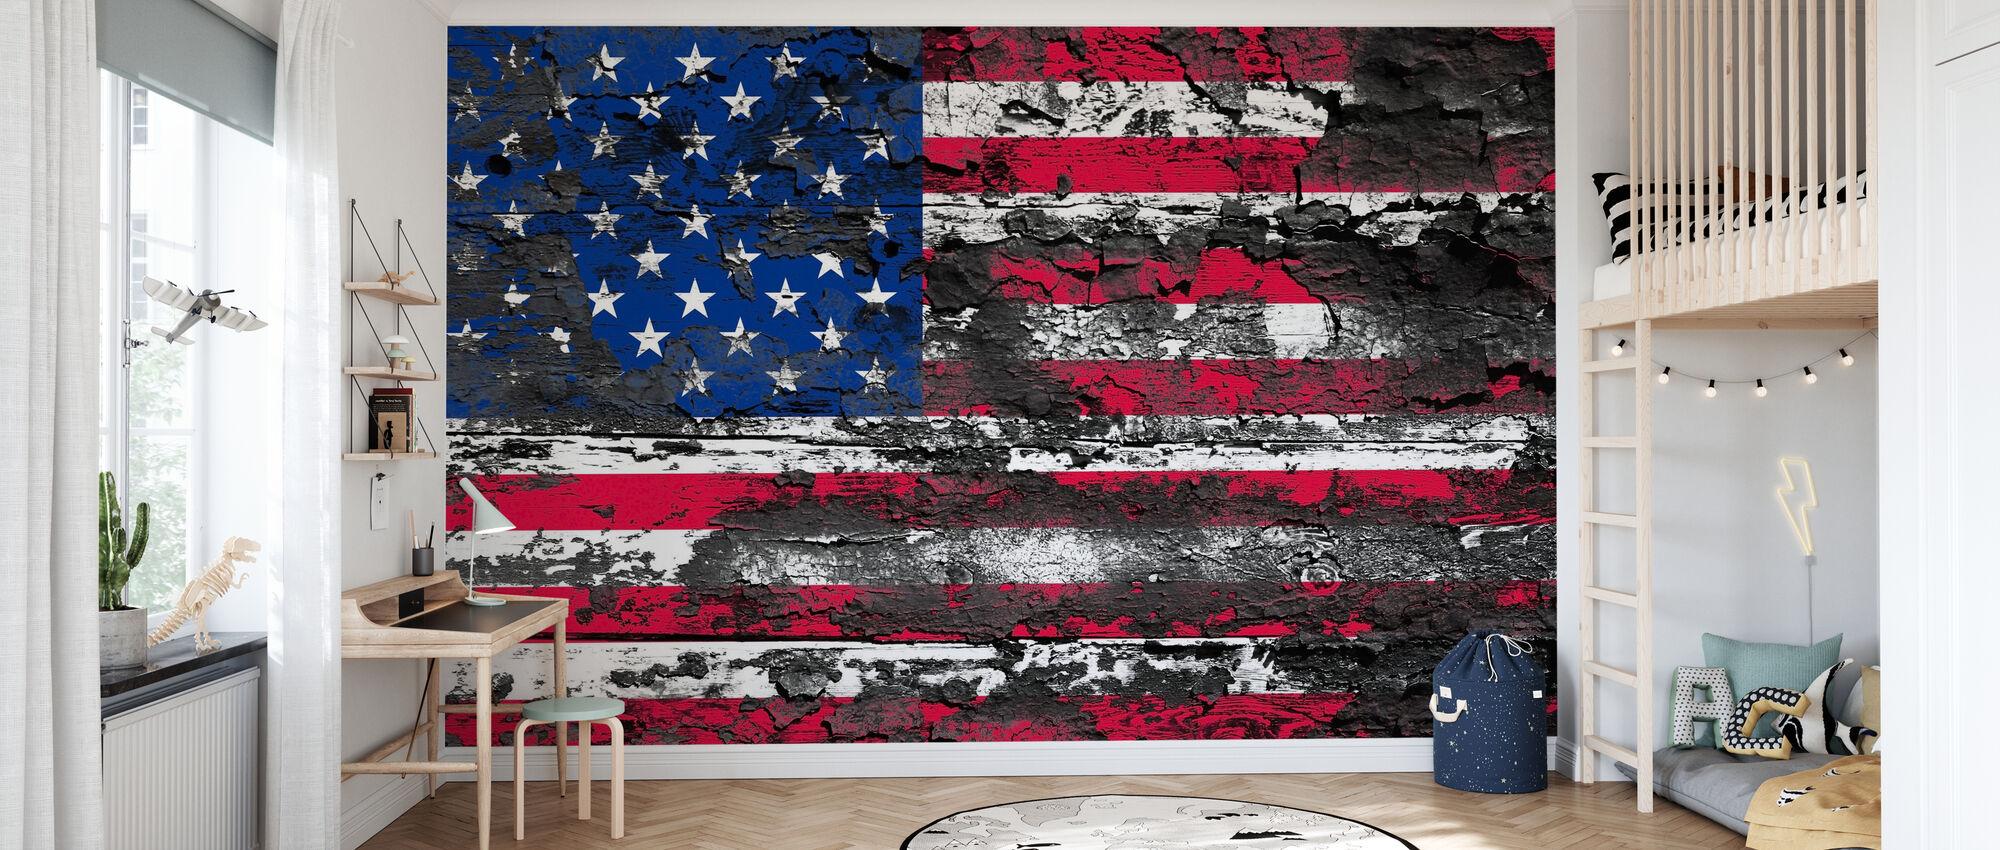 American Flag - Wallpaper - Kids Room